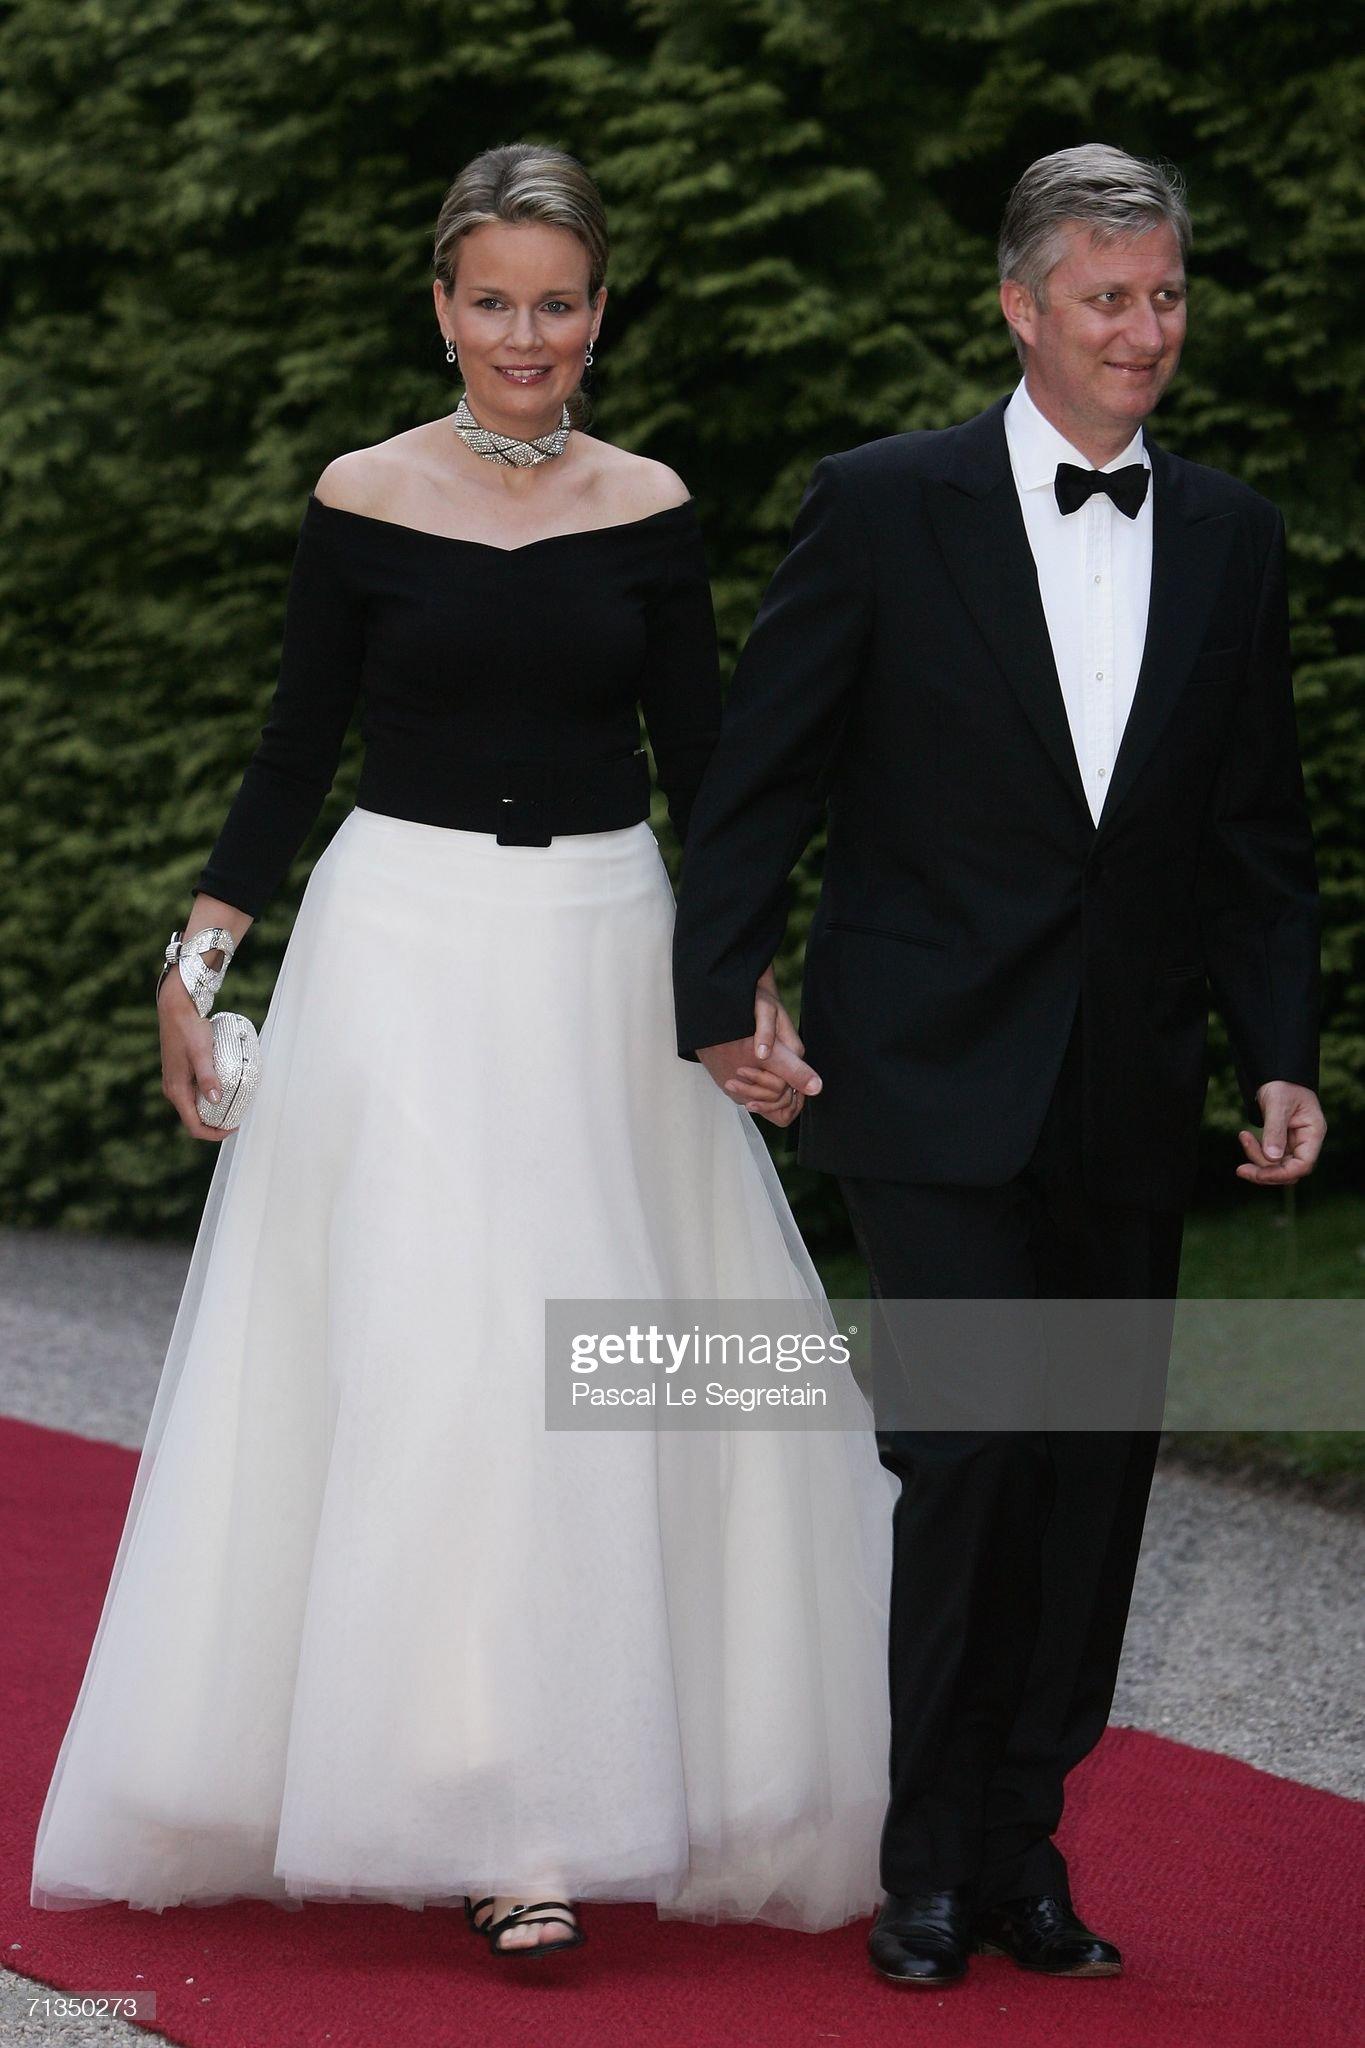 Вечерние наряды Королевы Матильды Silver Wedding Anniversary Celebrations For Luxembourgs Grand Duke & Duches : News Photo